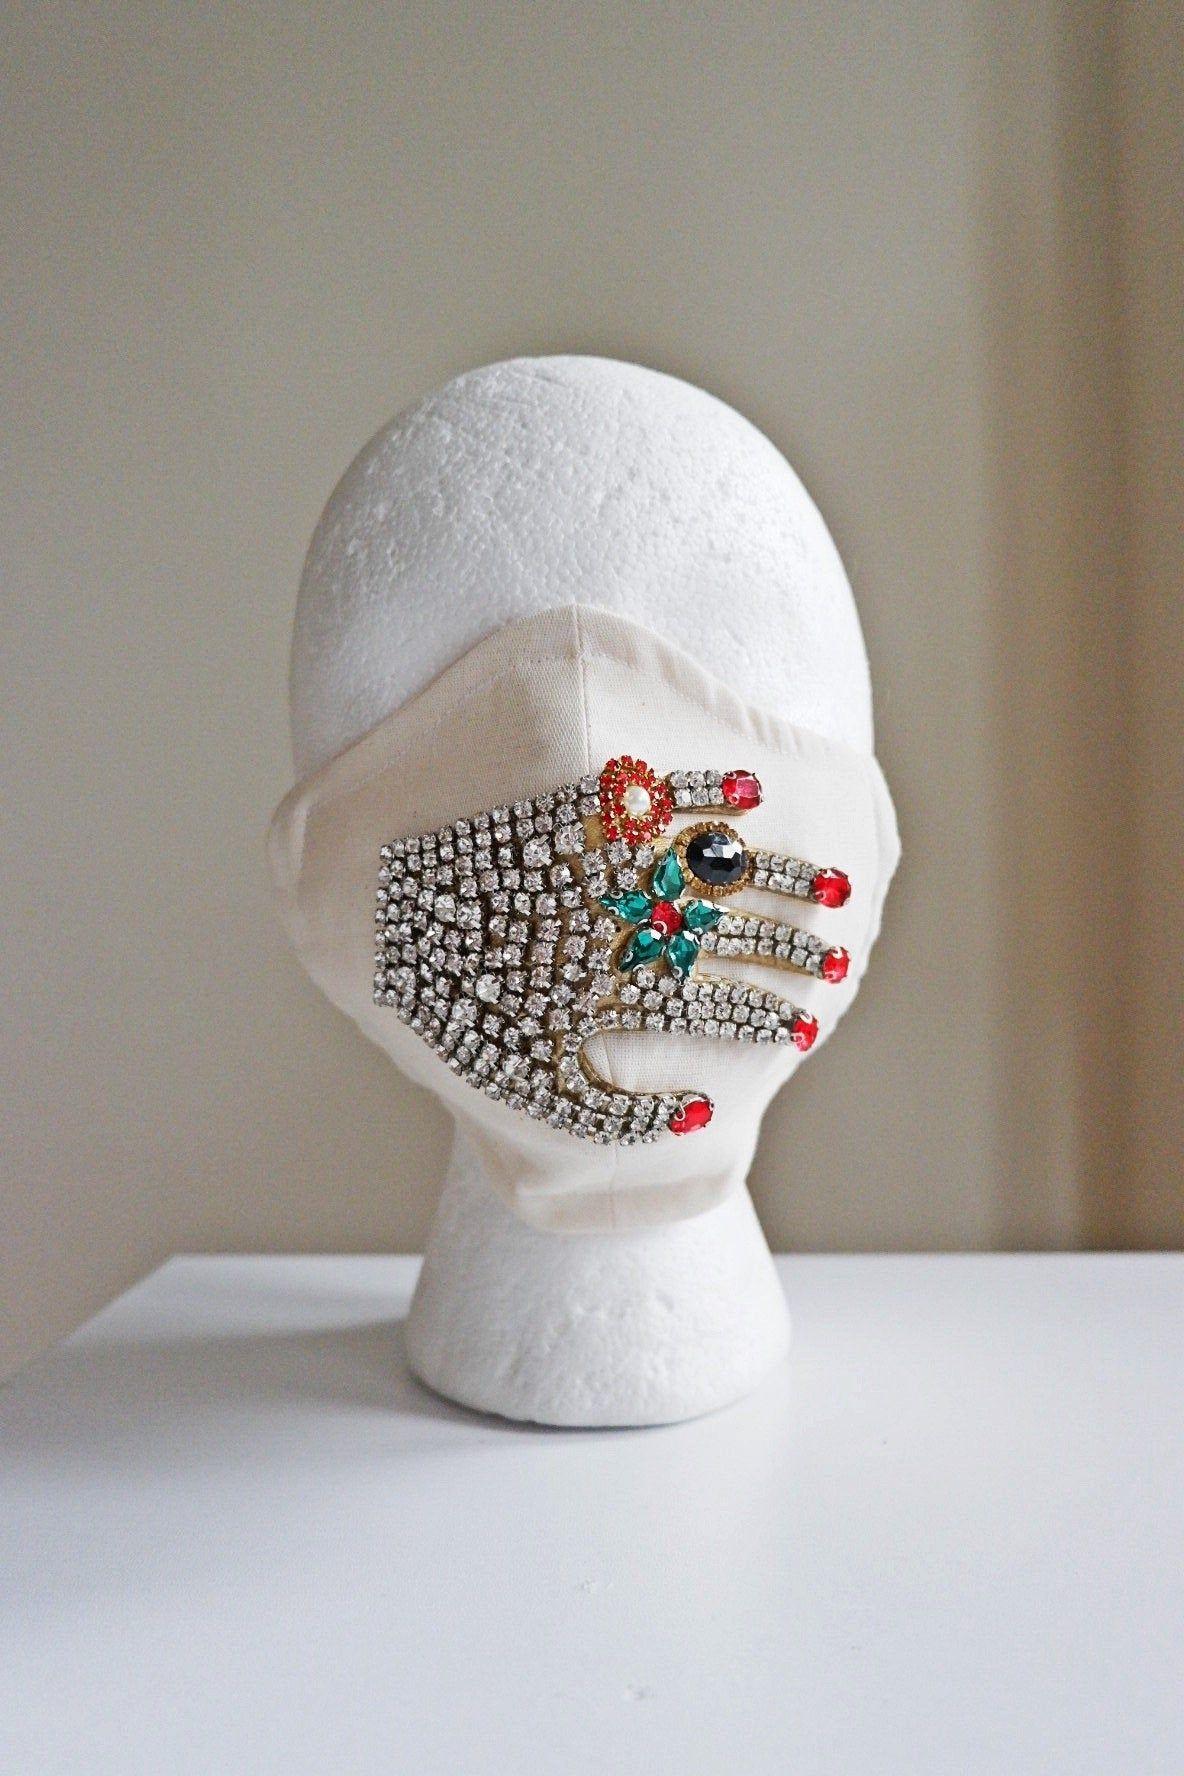 Off White Bedazzled Bling Face Mask/ Bridal Rhinestone